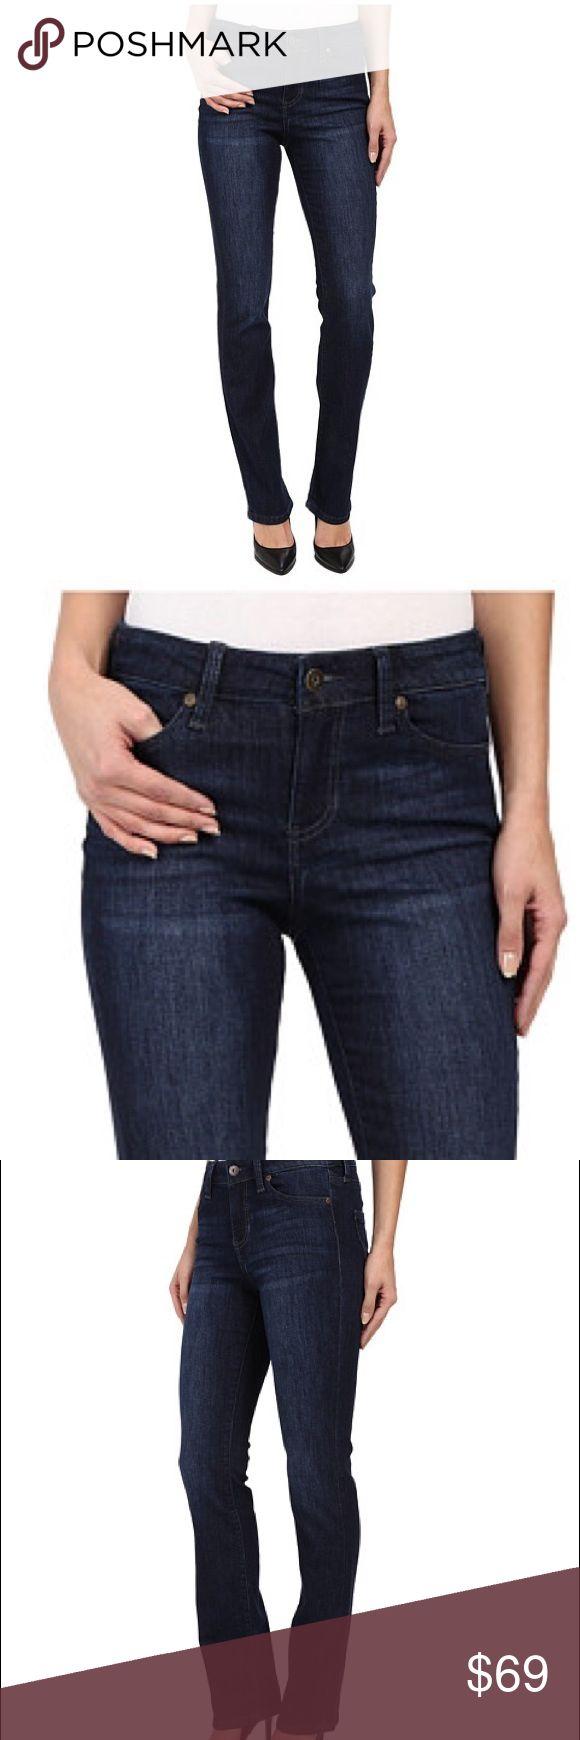 Liverpool Sadie Straight Liverpool straight leg jean in dark denim. Liverpool Jeans Company Jeans Straight Leg